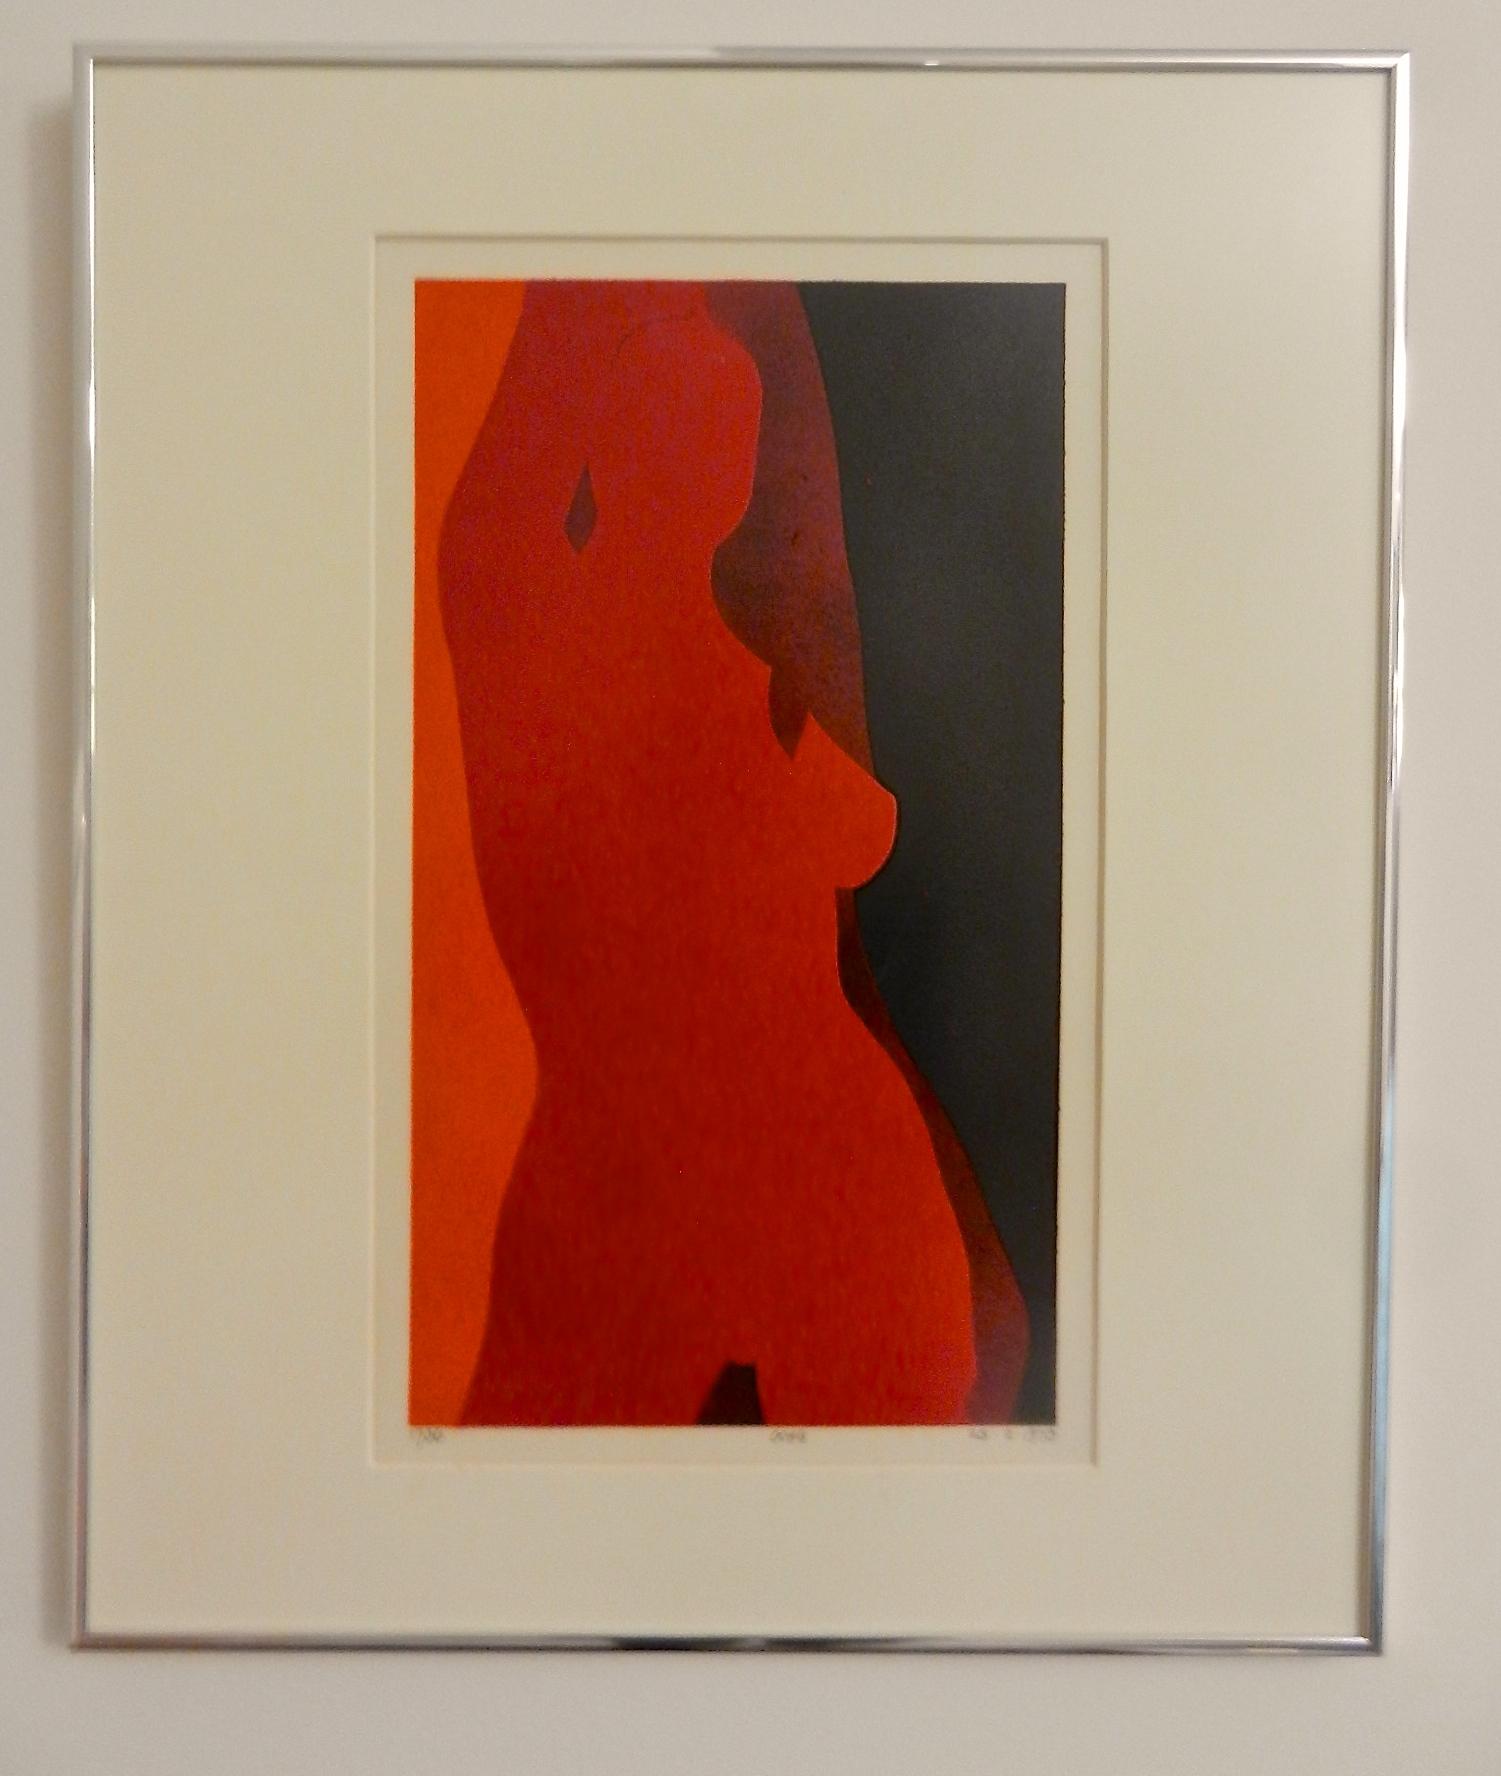 'Christine Keeler', 1964